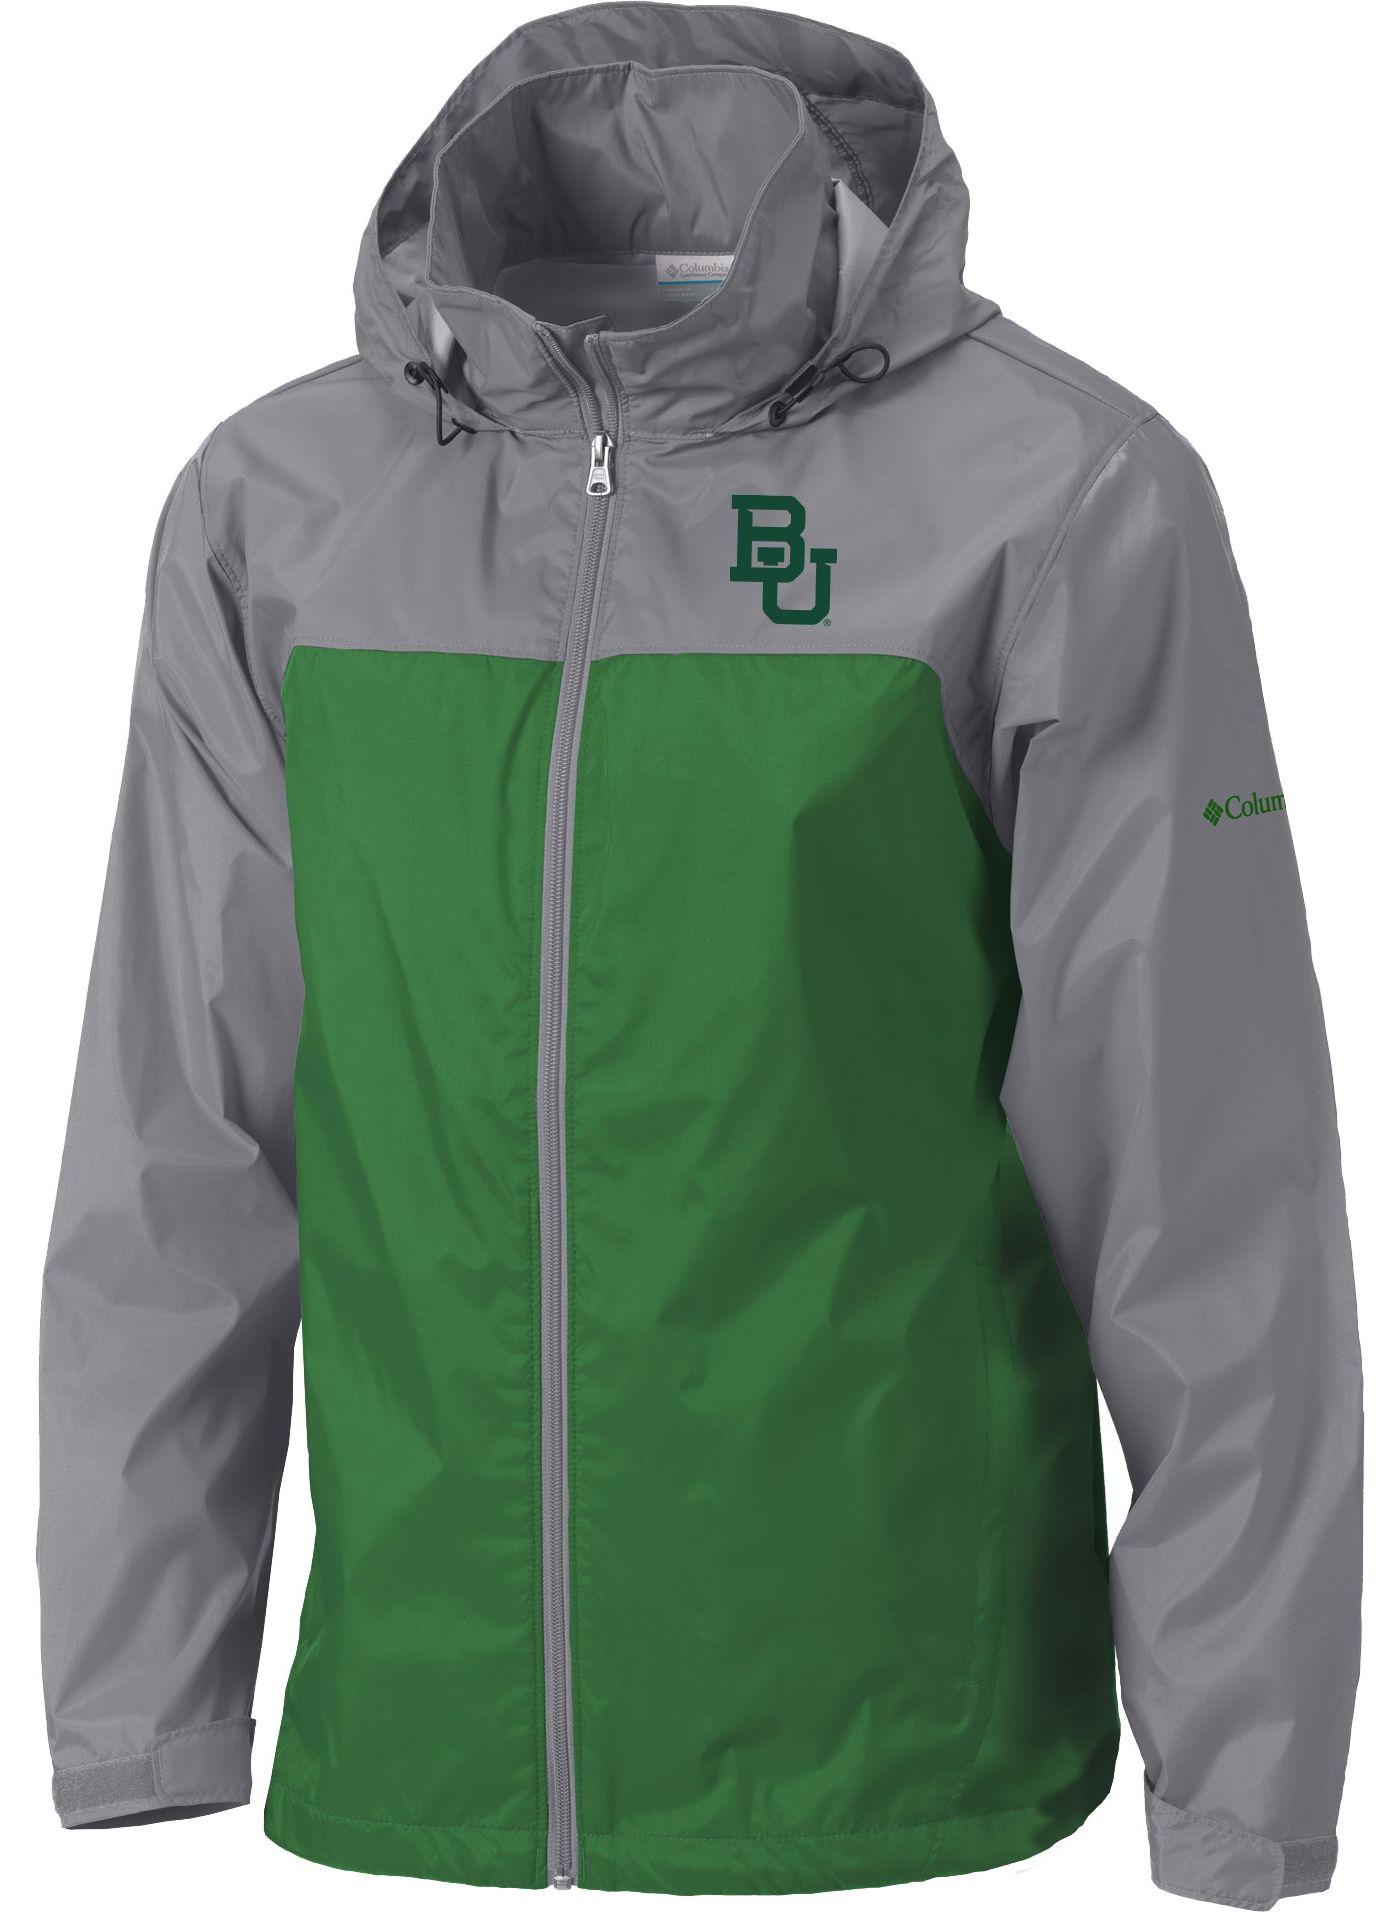 Columbia Men's Baylor Bears Grey/Green Glennaker Lake II Jacket